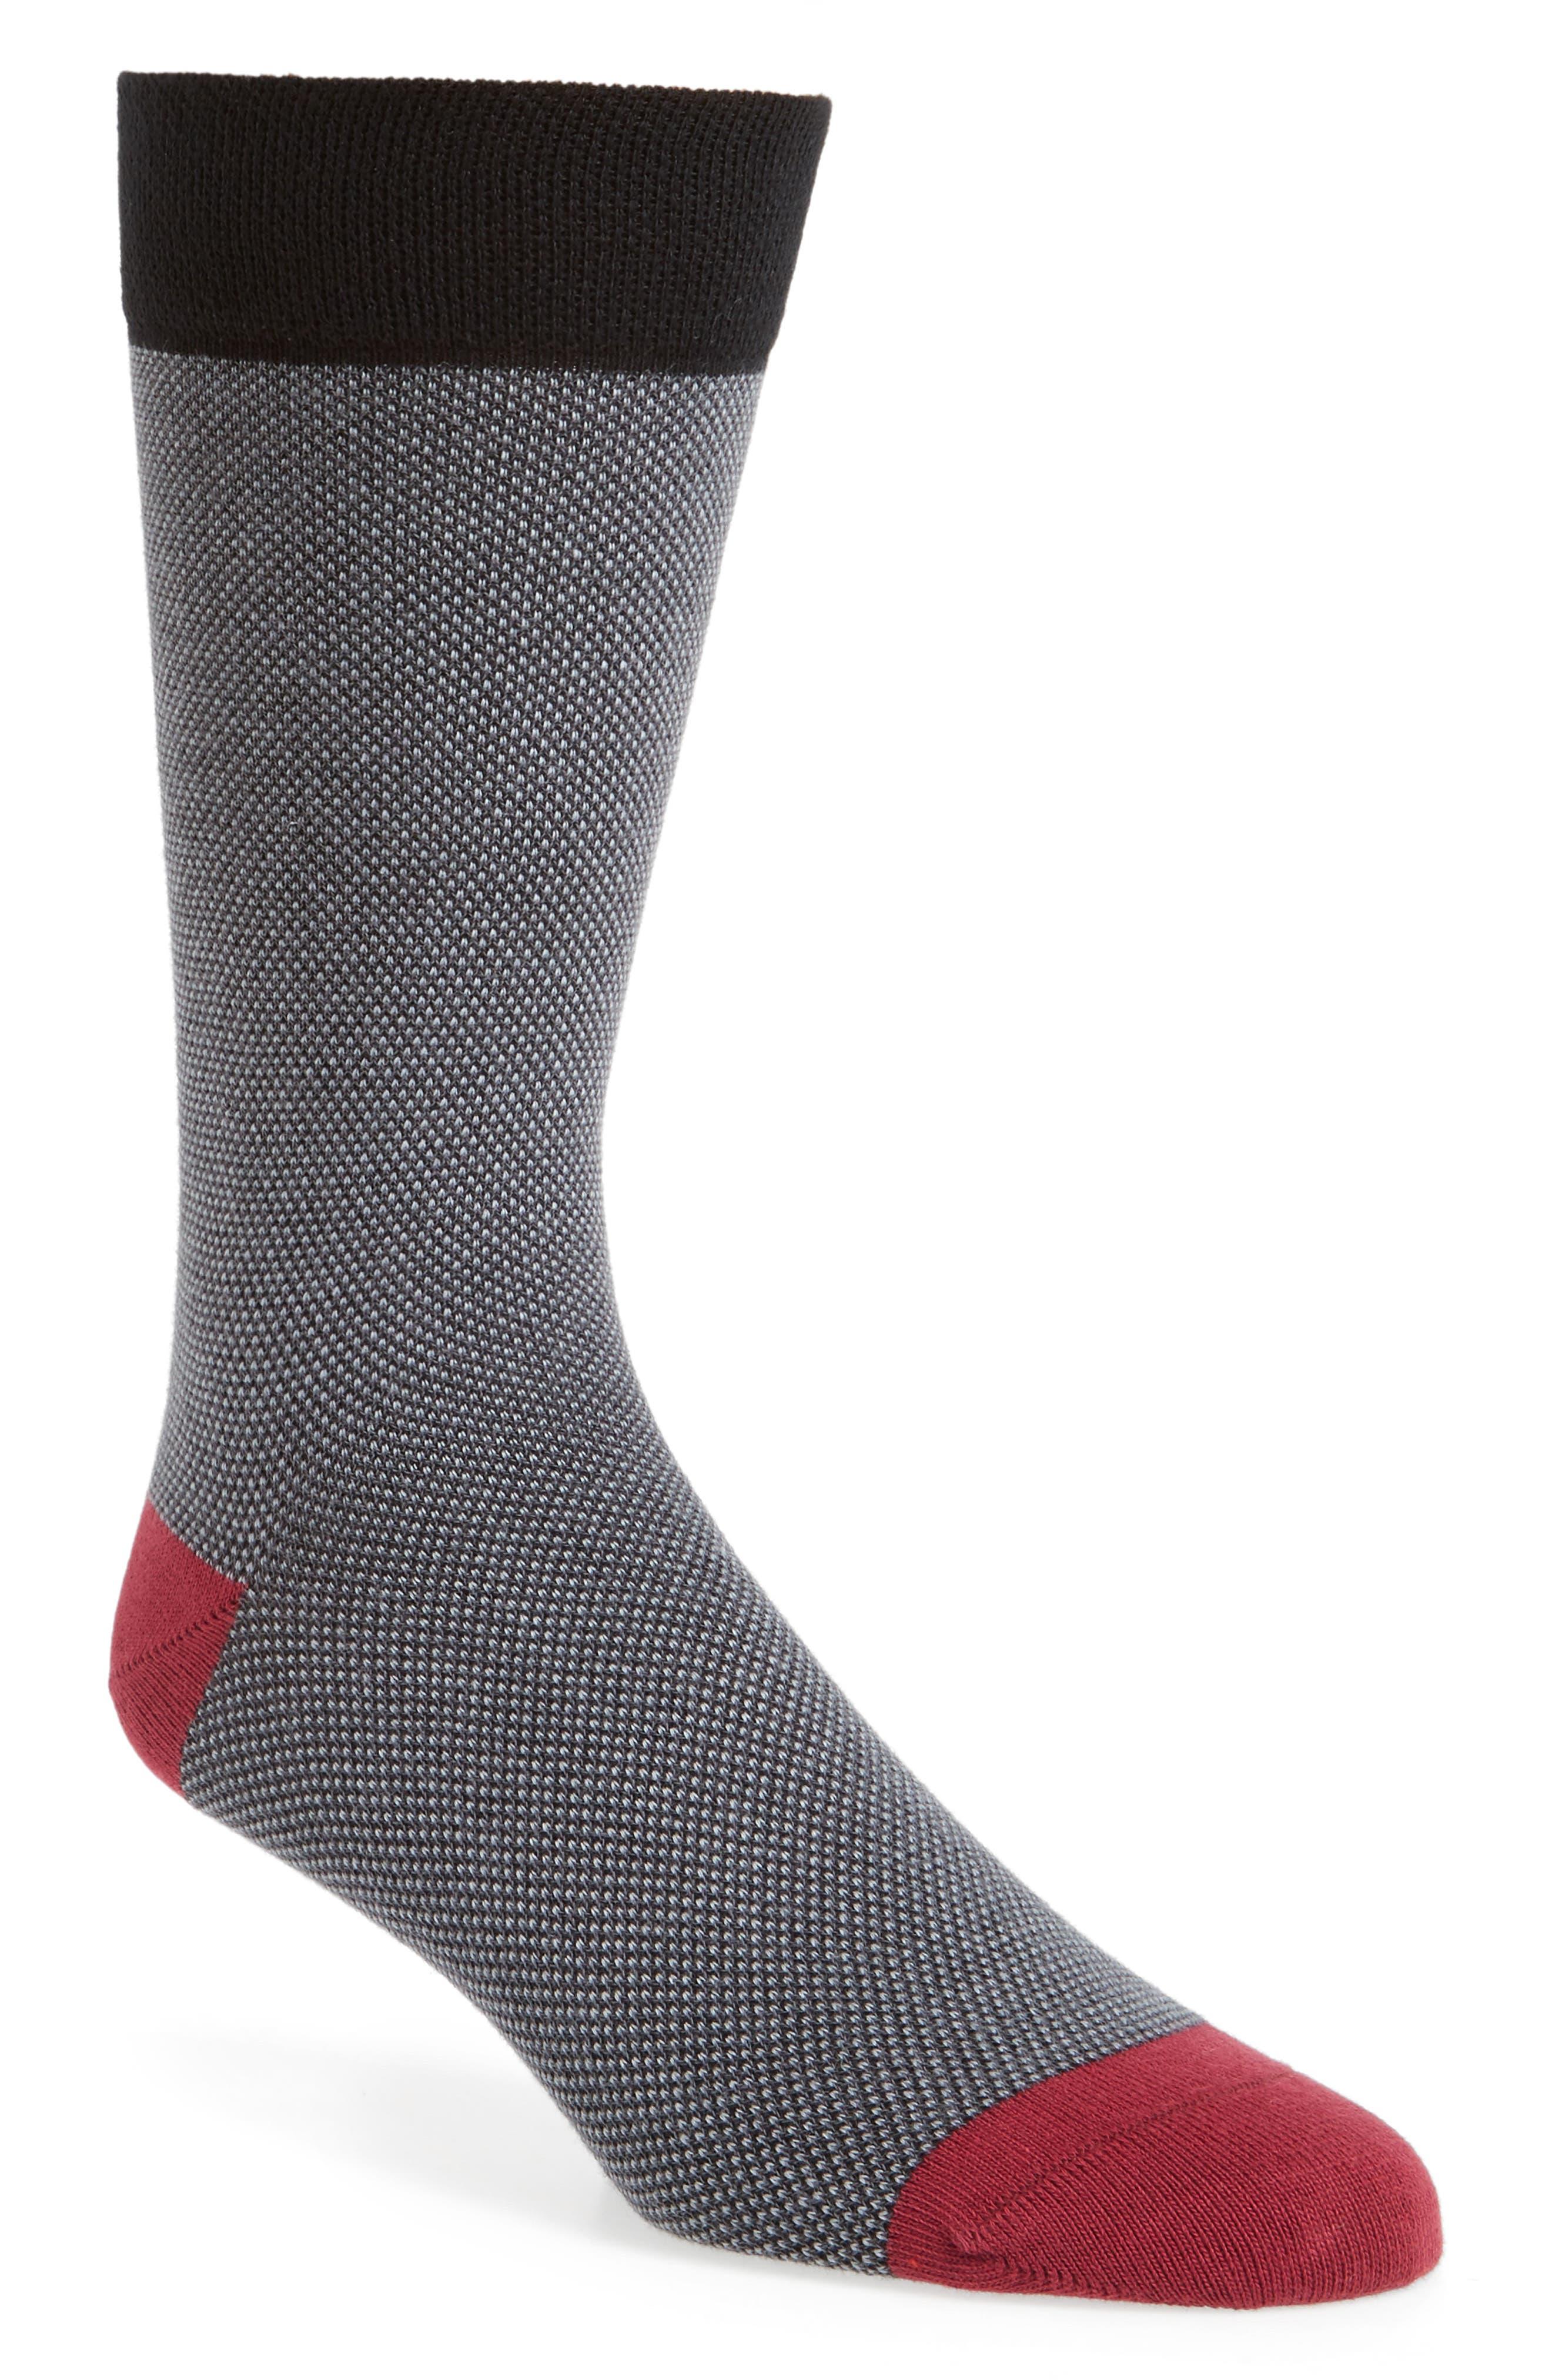 Joaquim Solid Socks,                         Main,                         color, Black/ Charcoal